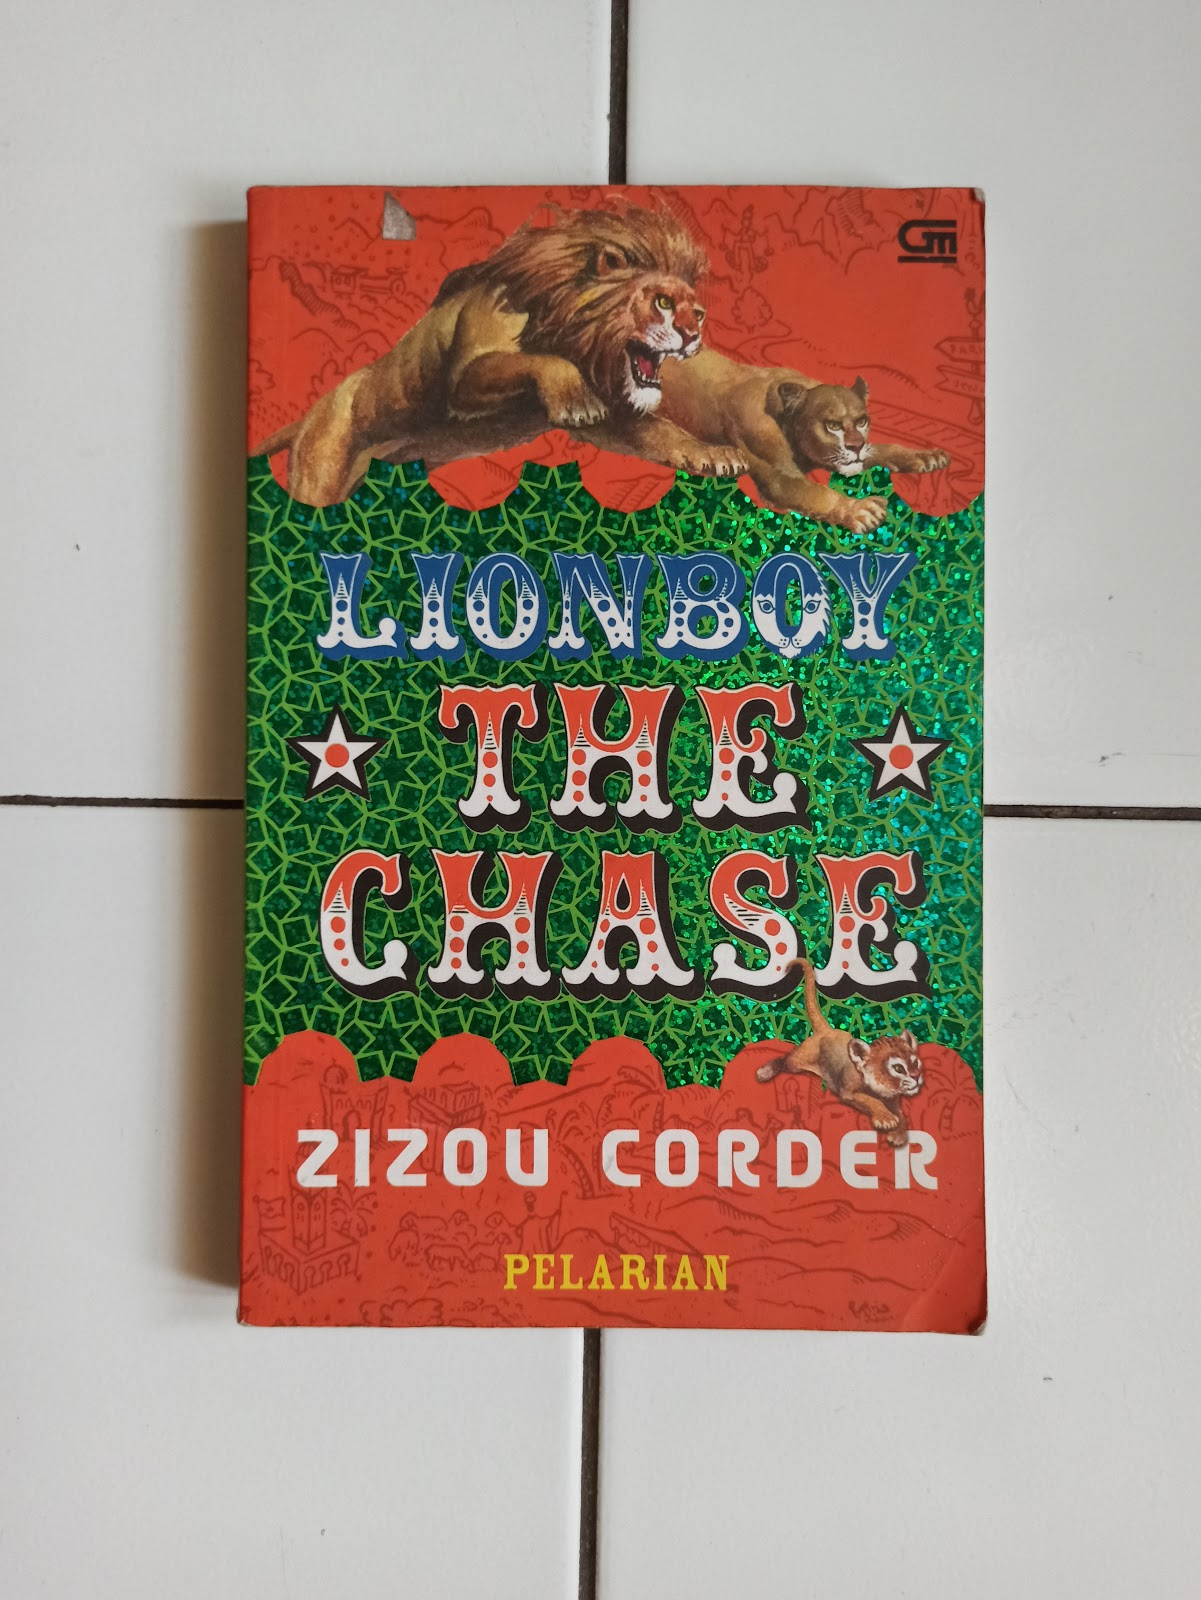 Lion Boy Pelarian Penulis Zizou Corder